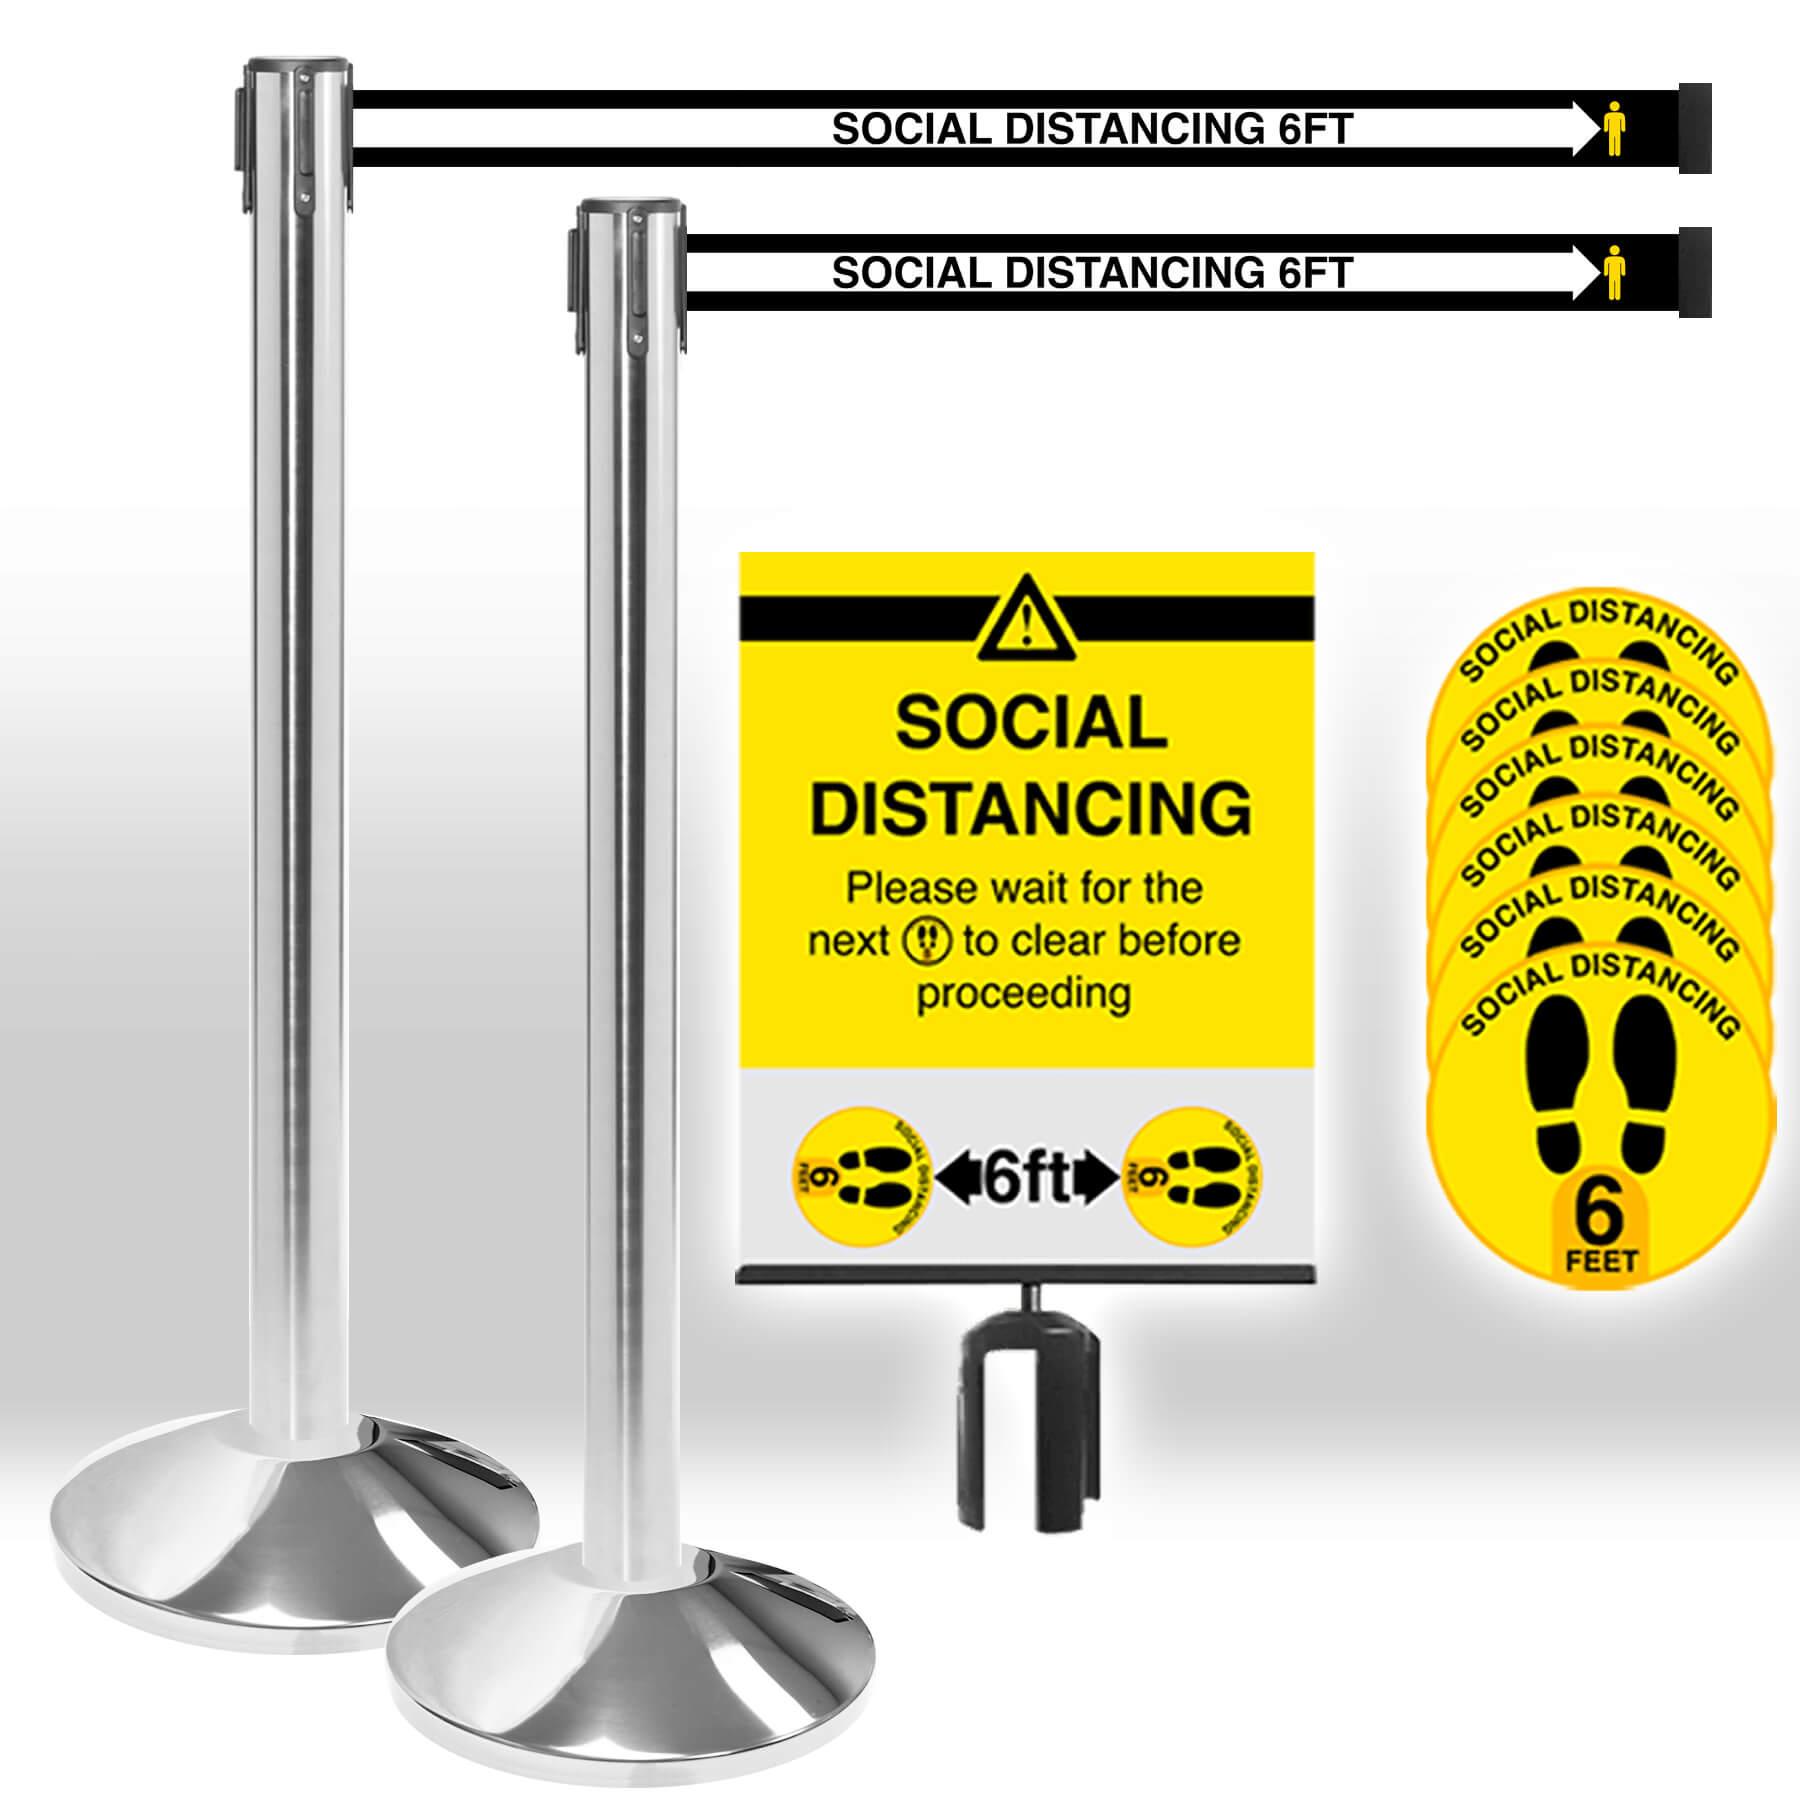 social-distancing-bundle-polished-cc